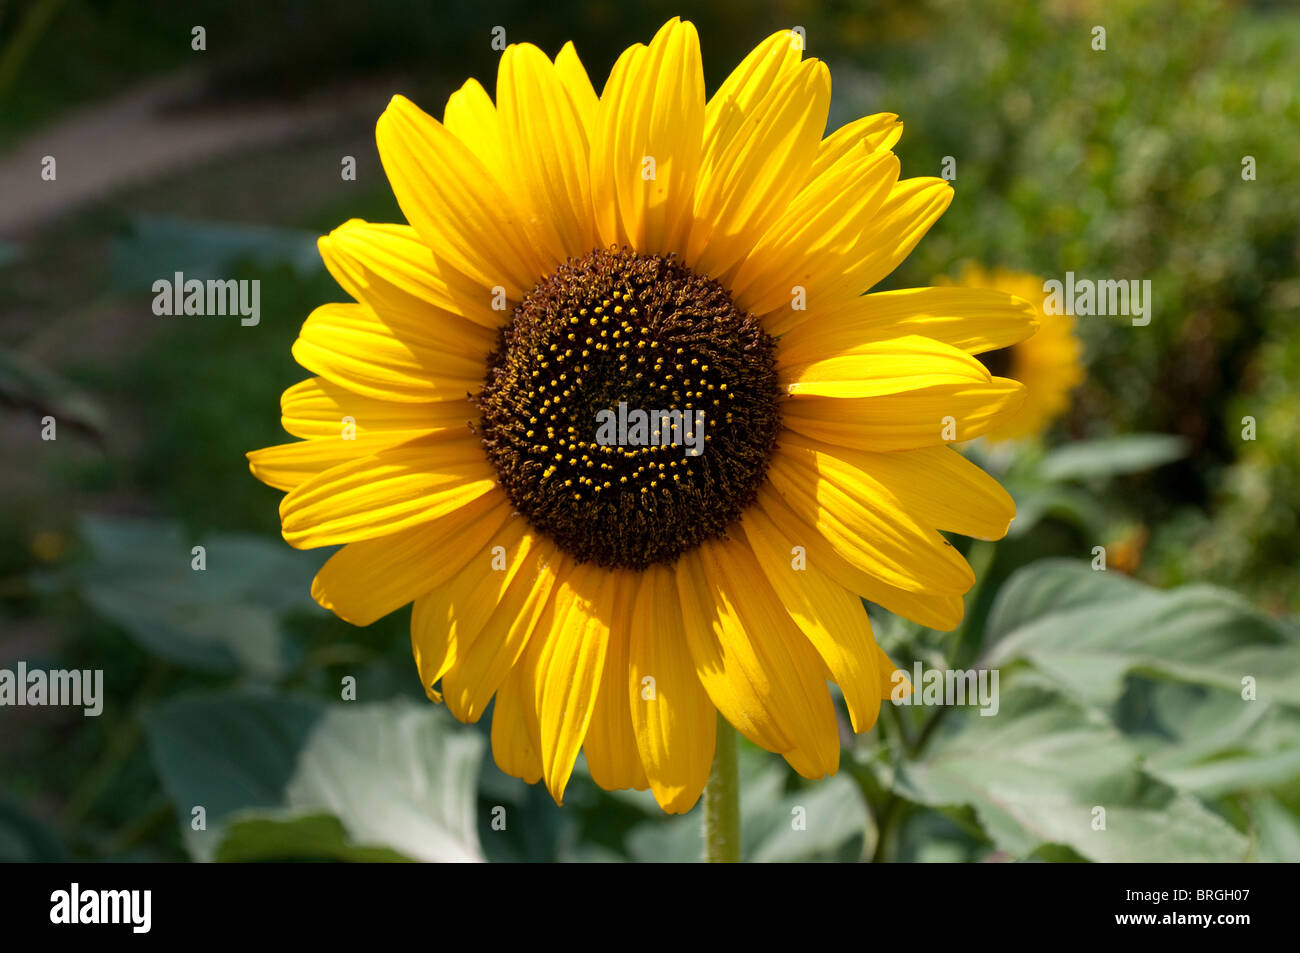 Helianthus annum, Sunflower - Stock Image